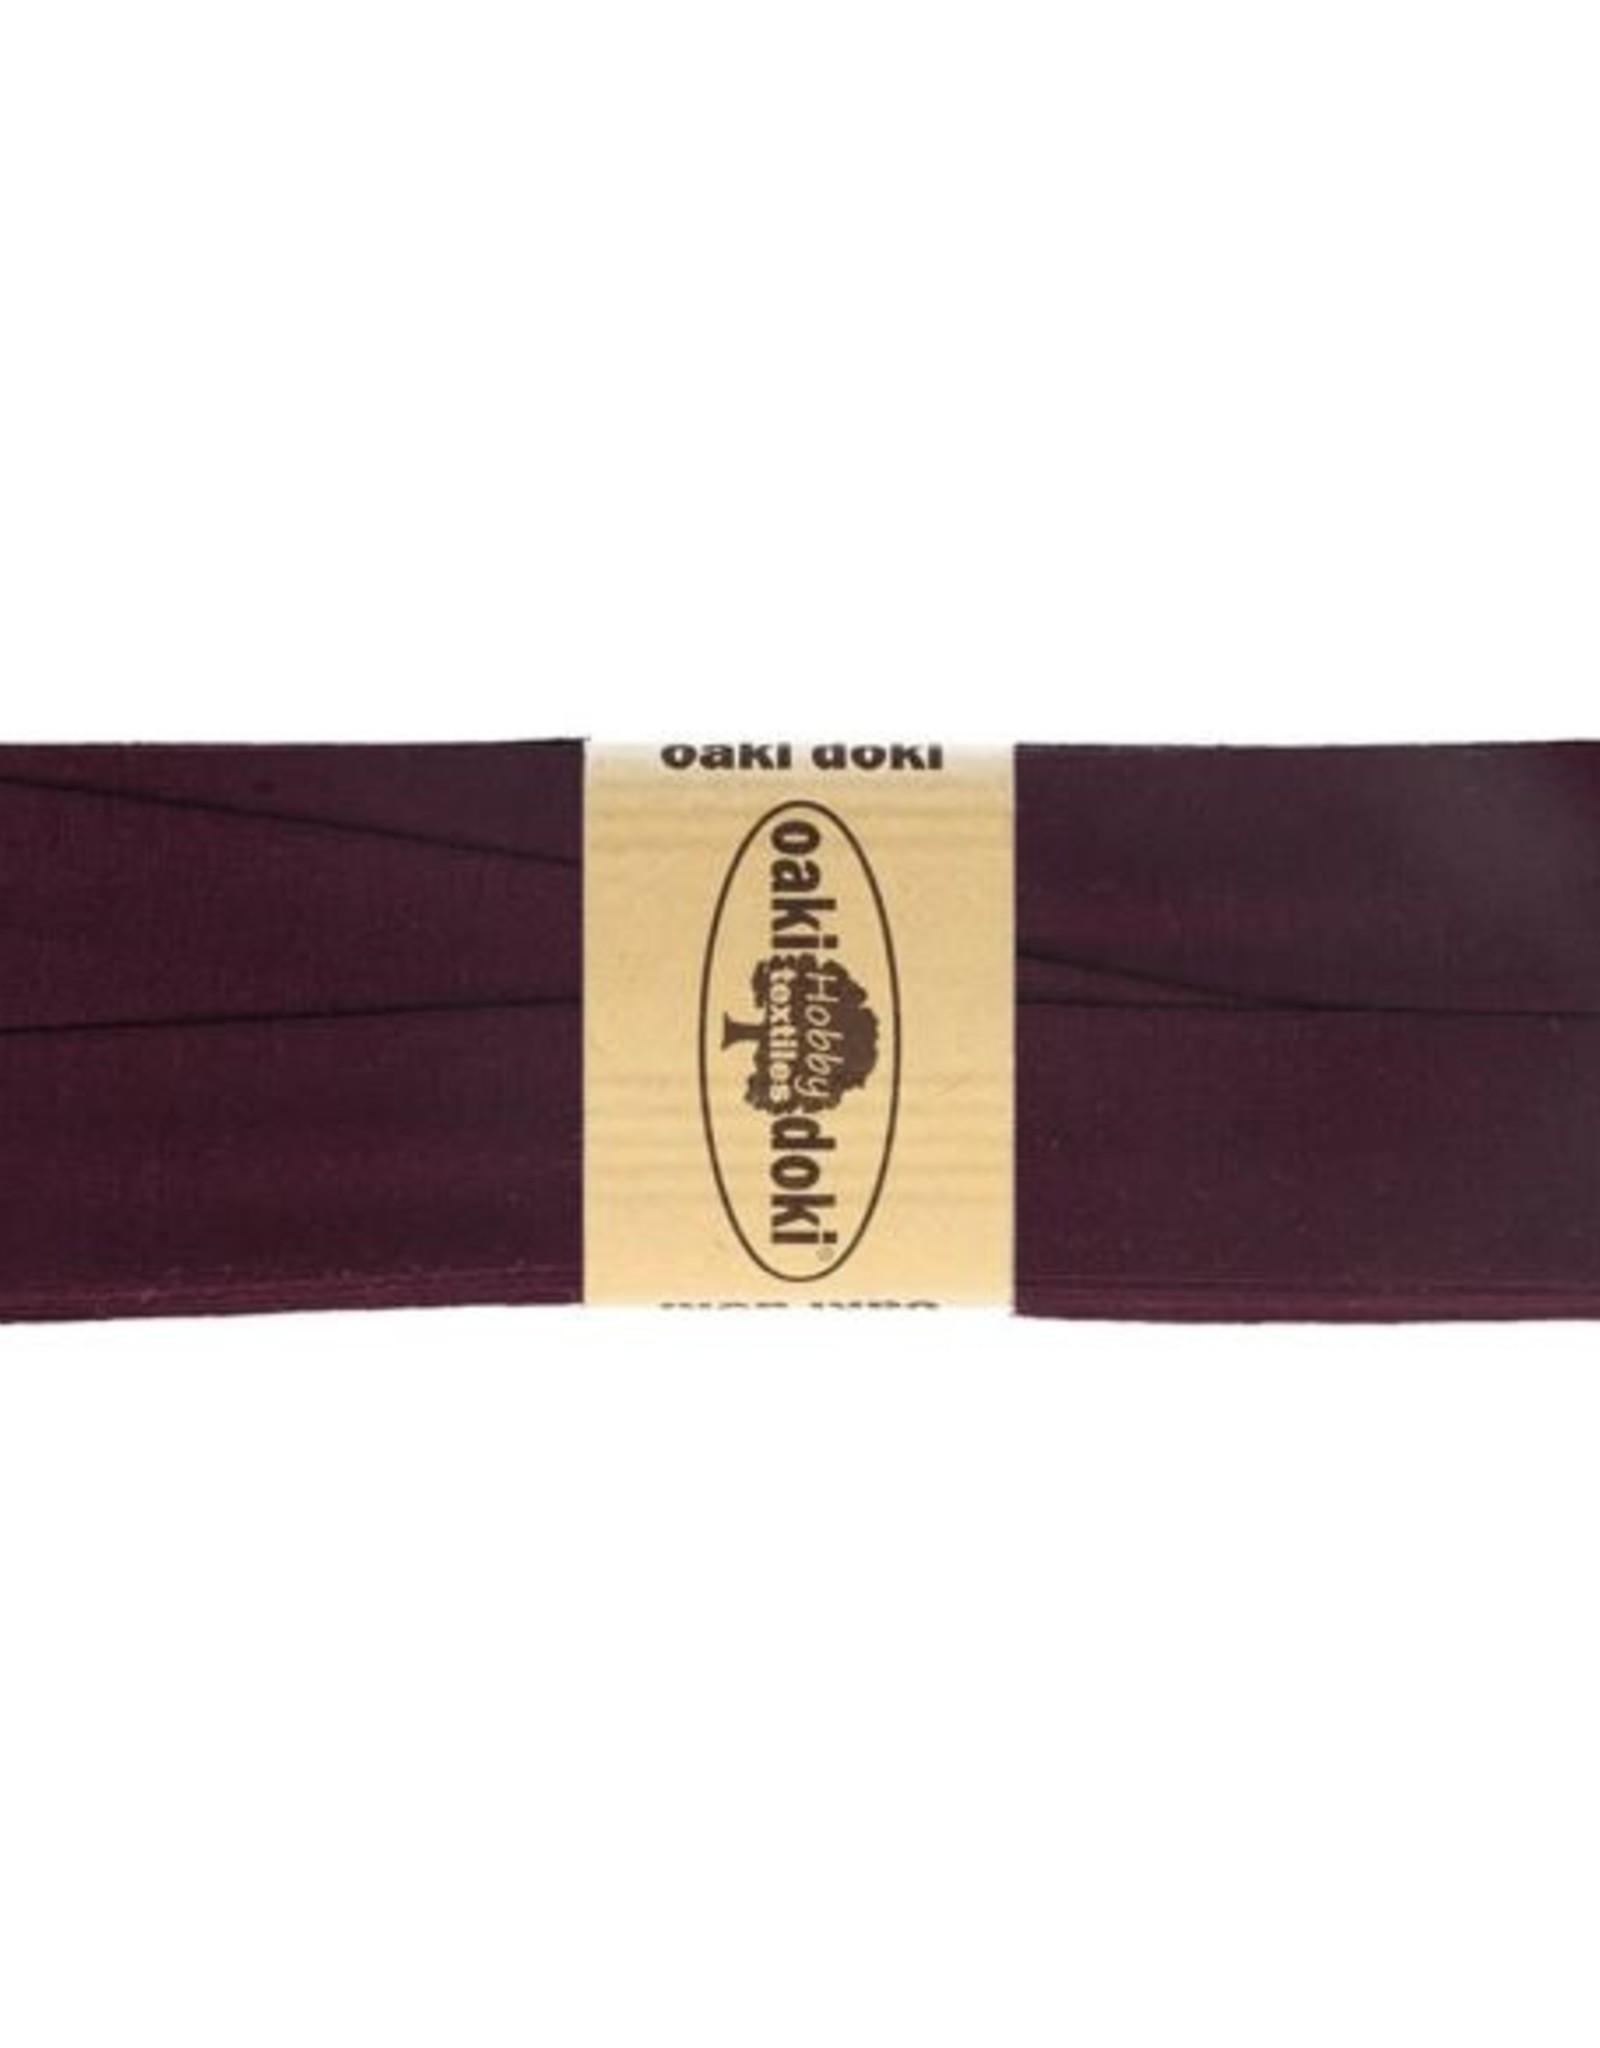 Oaki Doki Tricot de luxe jersey biaisband 20mm x 3m 815